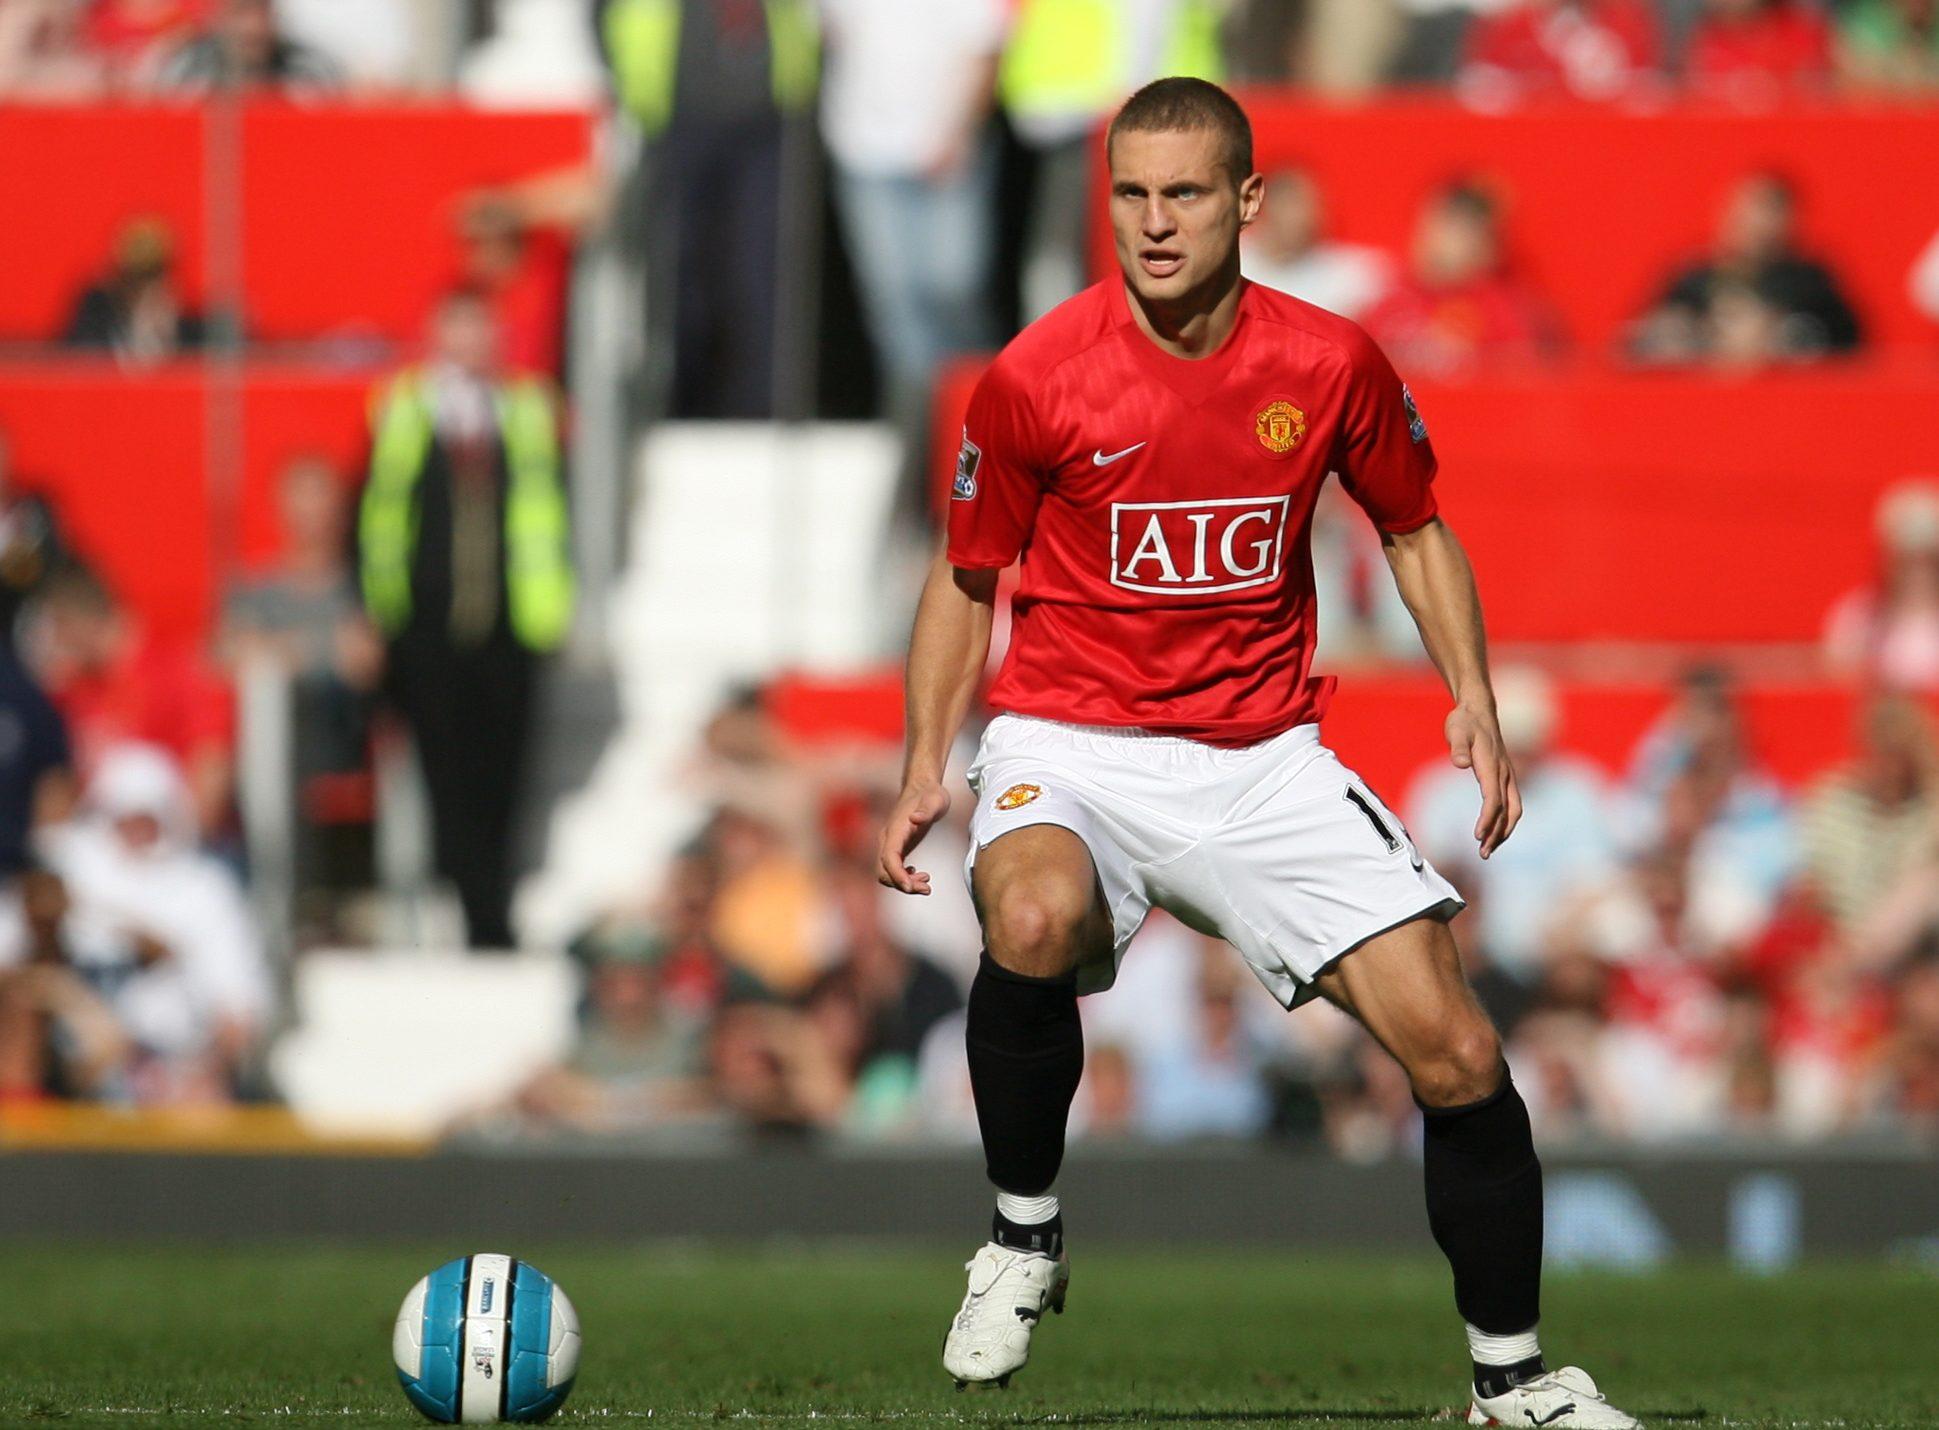 Nemanja Vidic for Manchester United